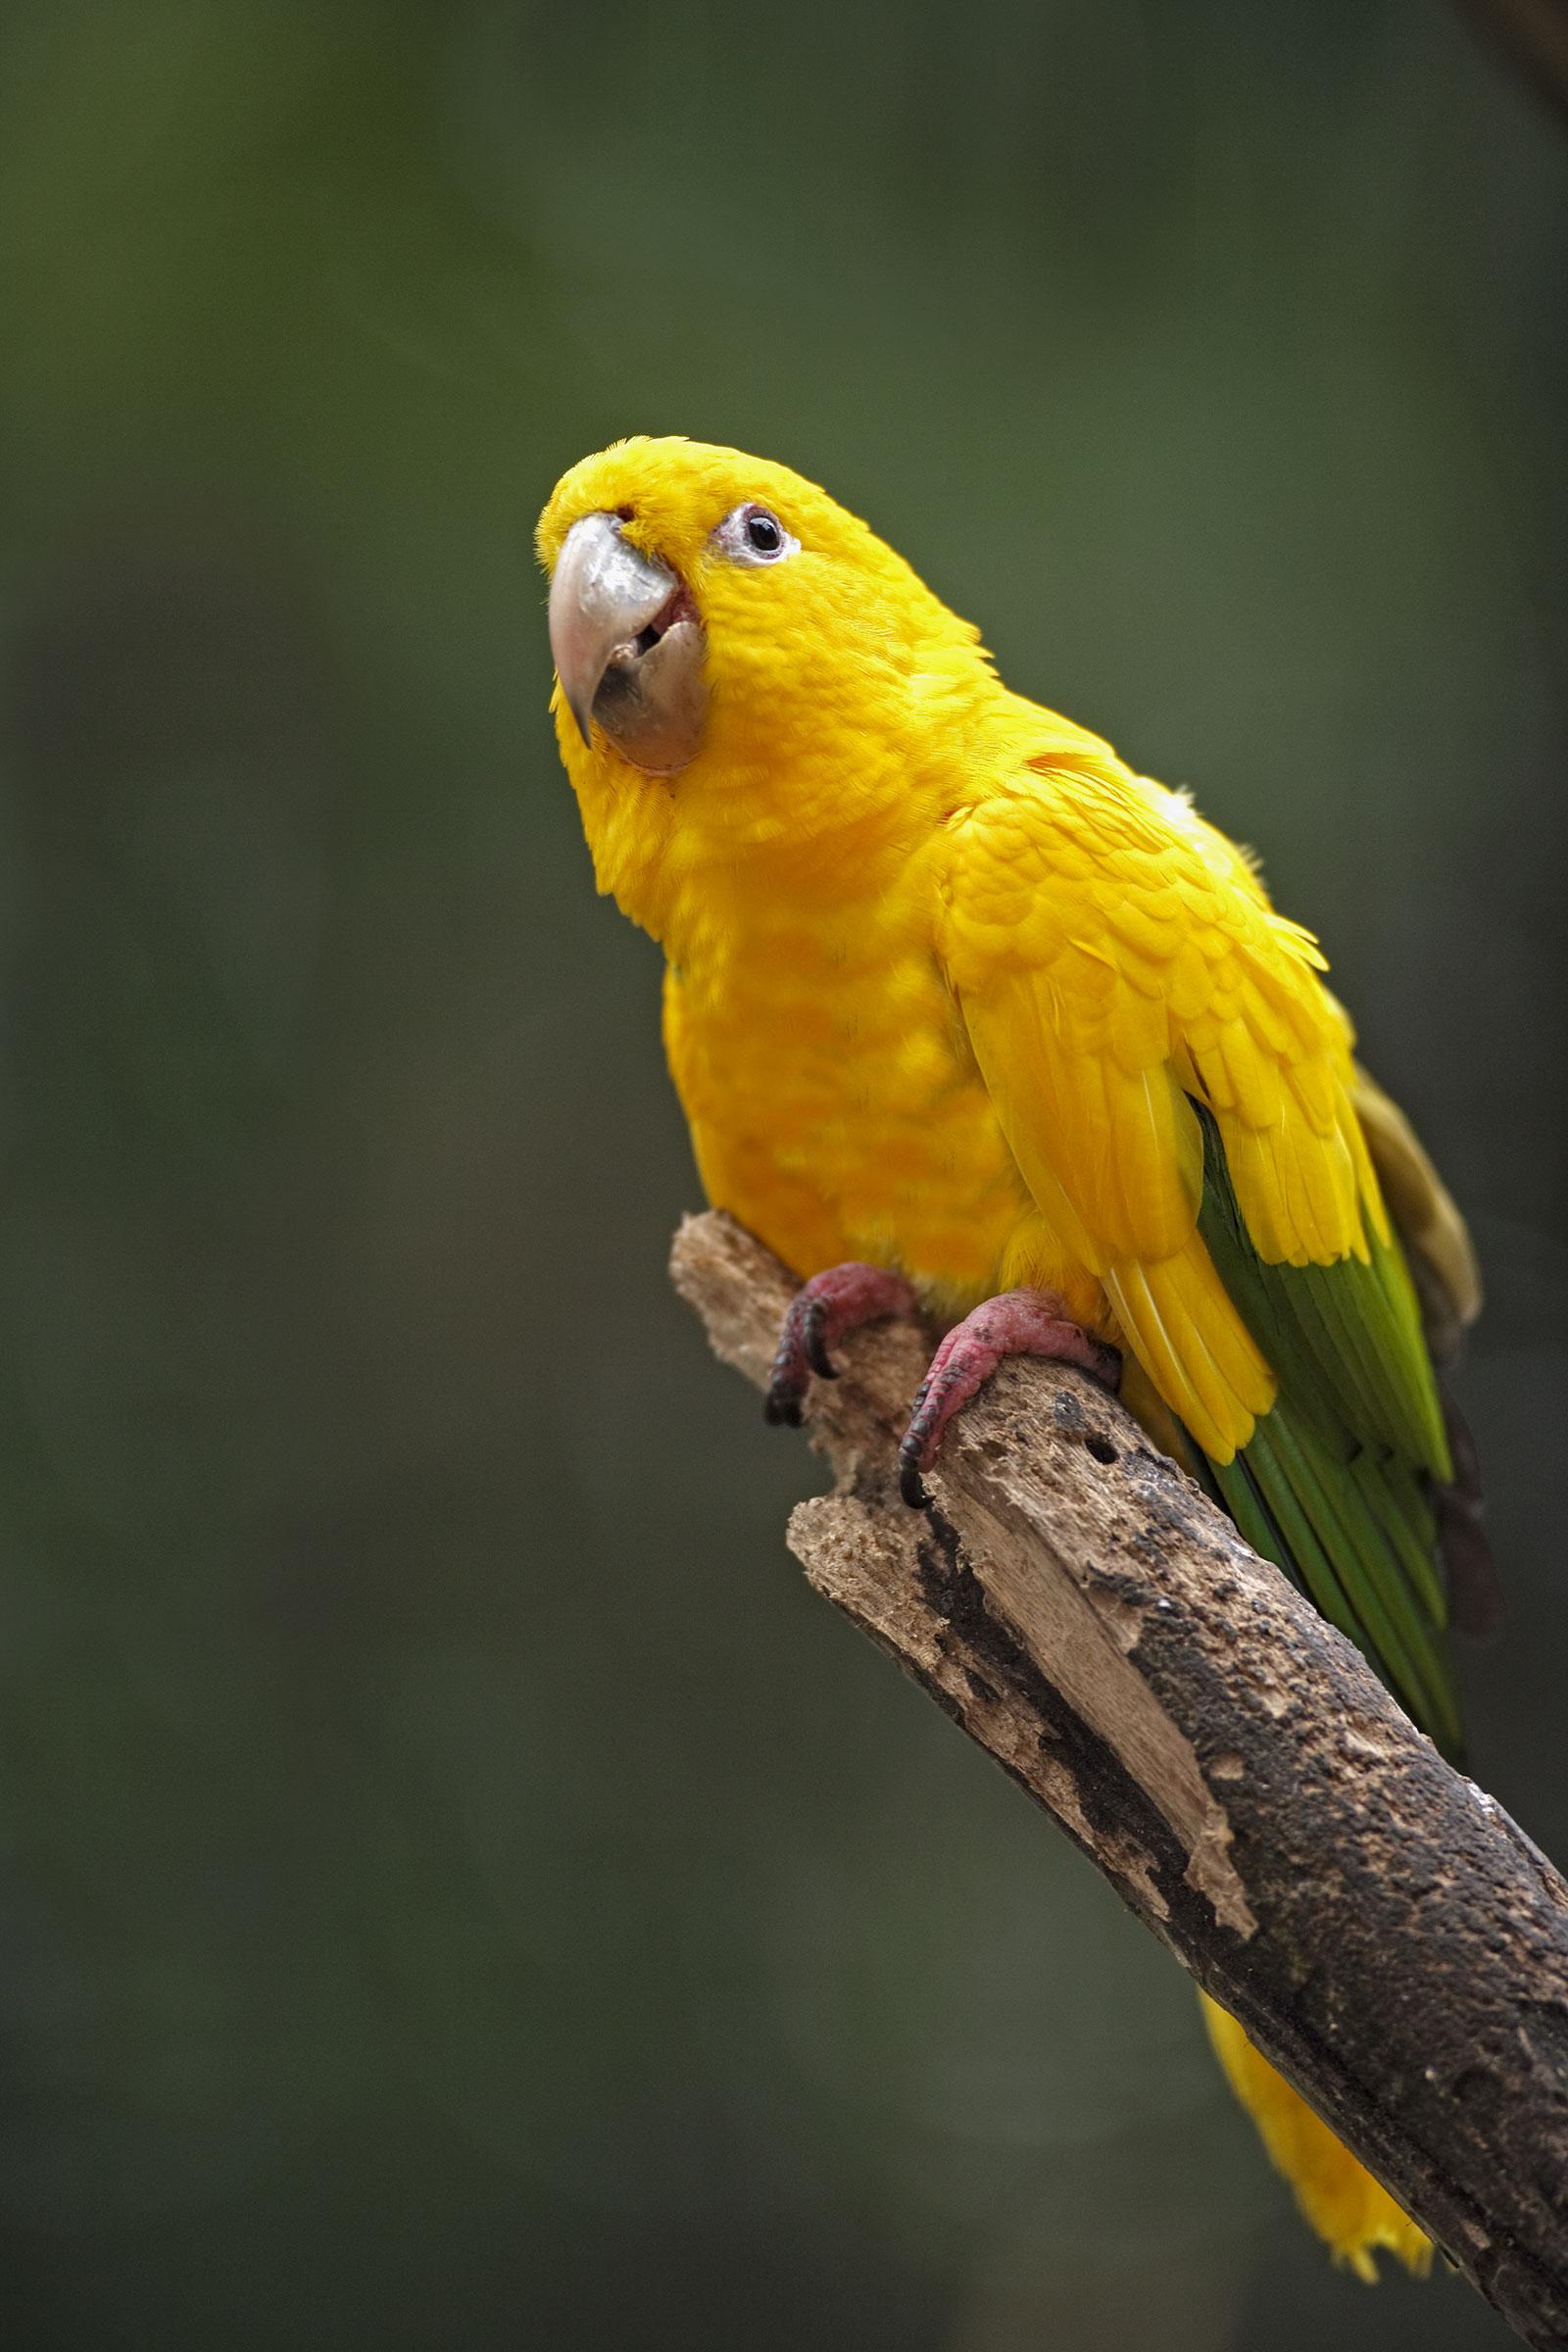 Golden Parakeet, found only in Brazil. Jurgen and Christine Sohns/Minden Pictures